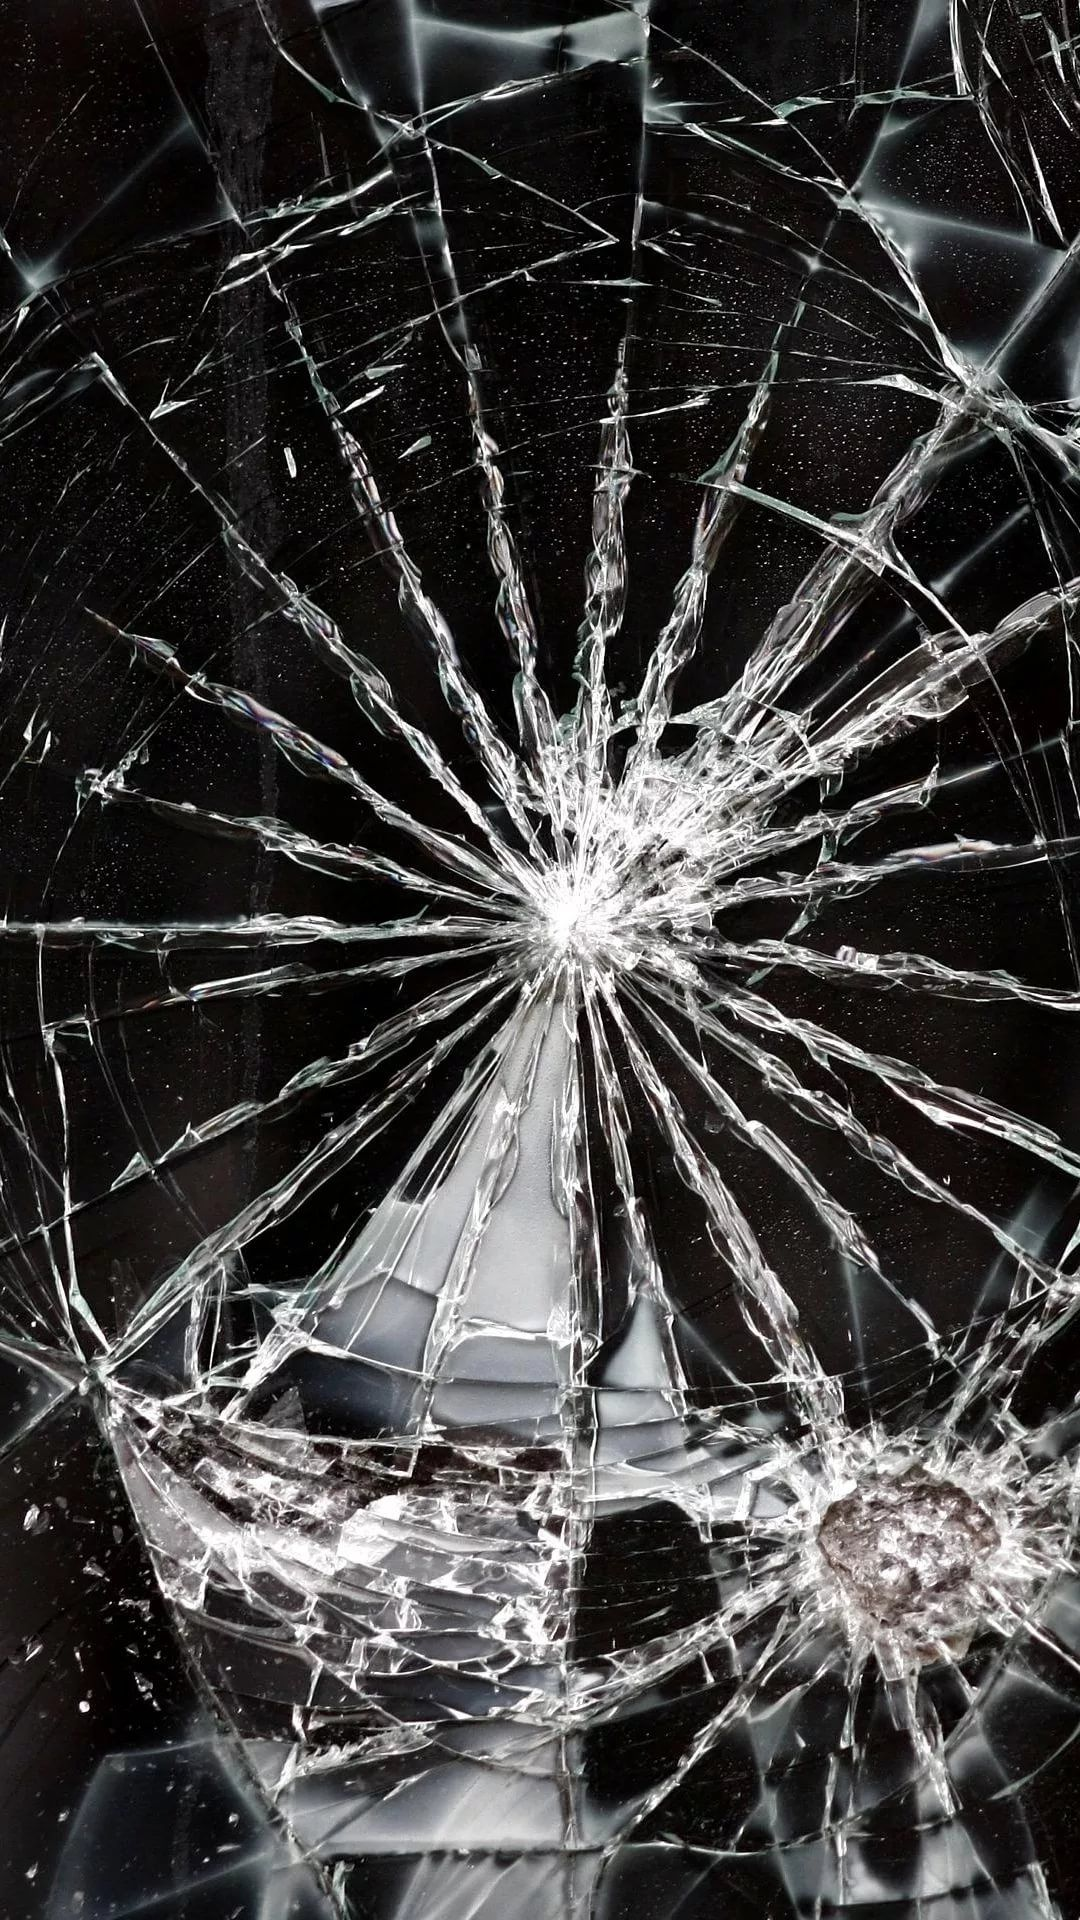 Cracked Phone iOS 7 wallpaper